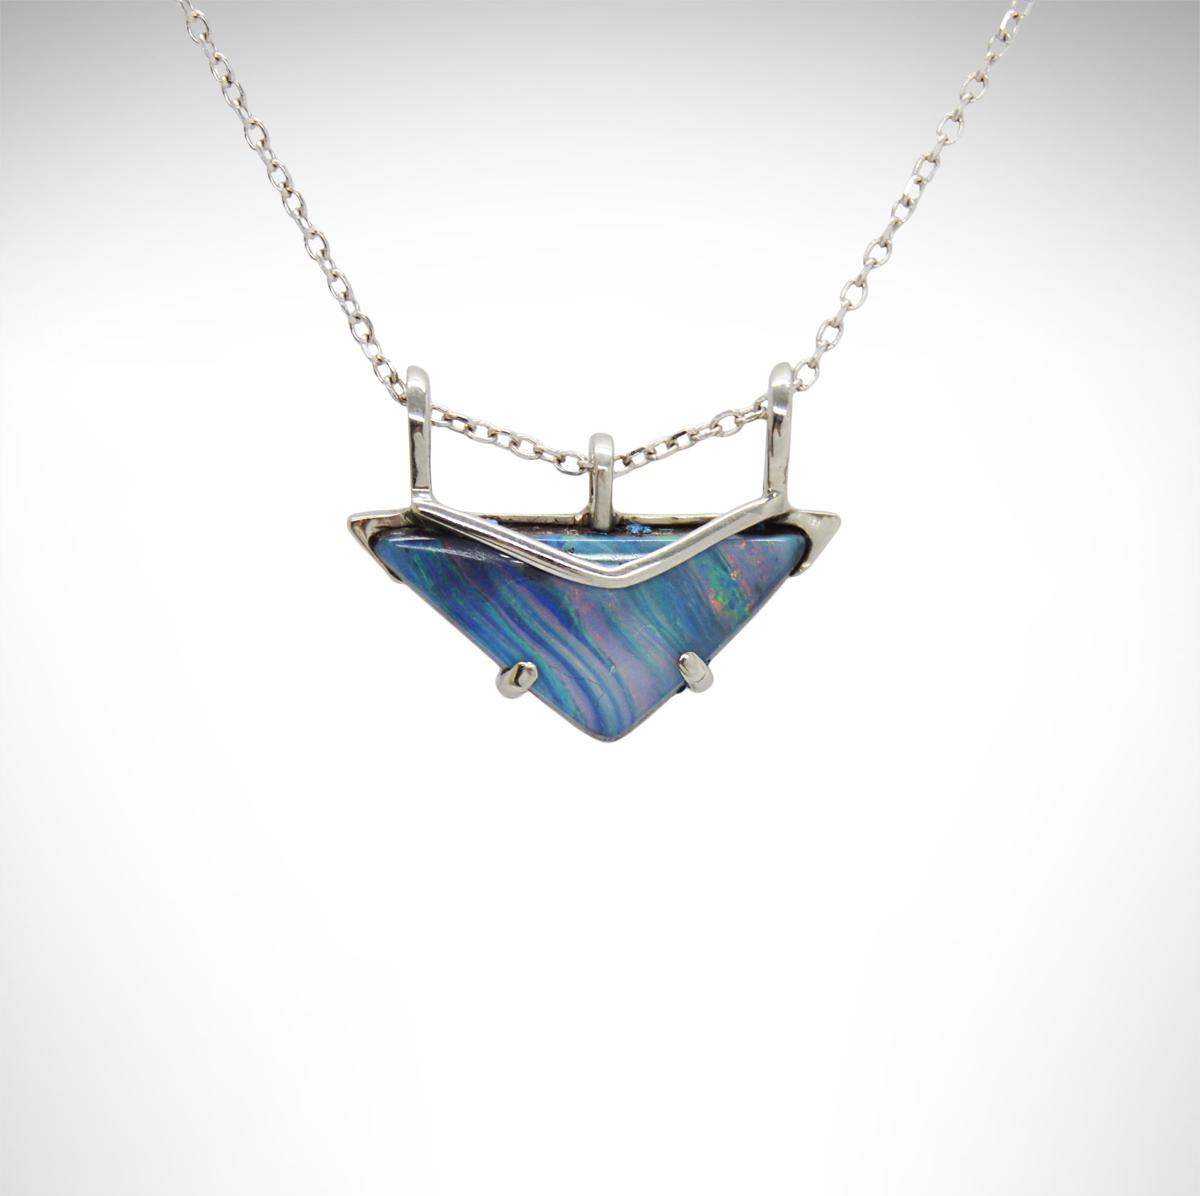 Boulder Opal Pendant  Australian Opal Necklace  Flashy Opal  Small Boulder Opal  Australian Opal